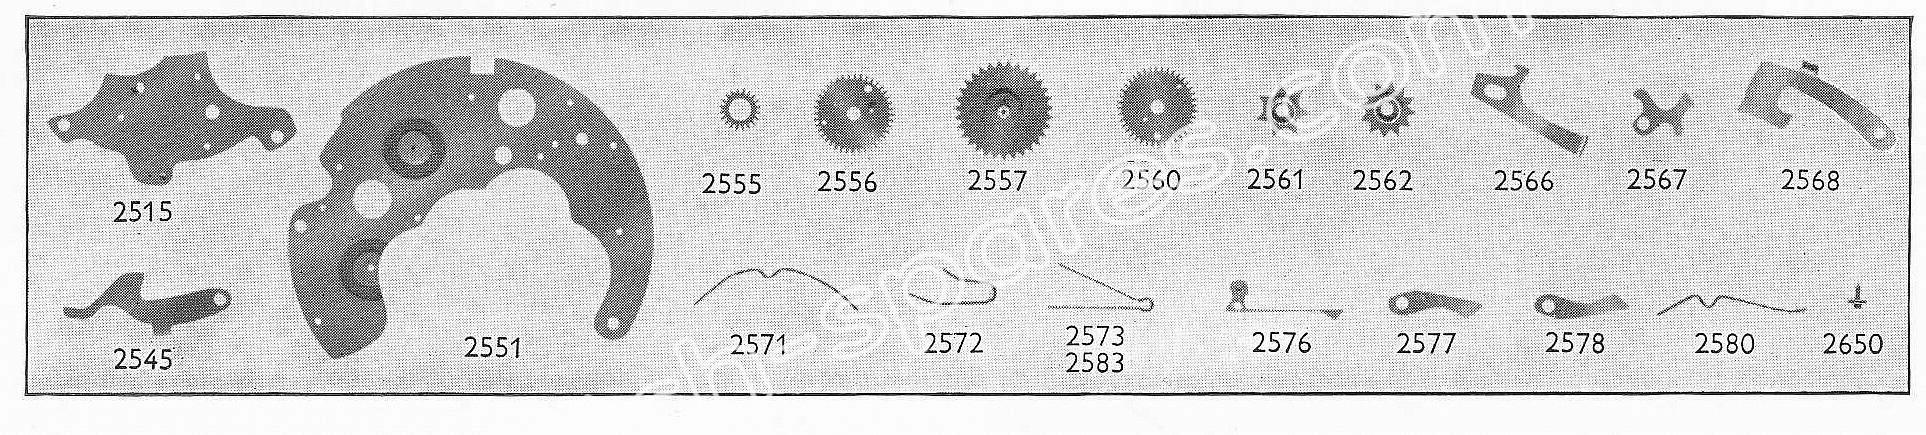 Landeron 185 watch date spare parts